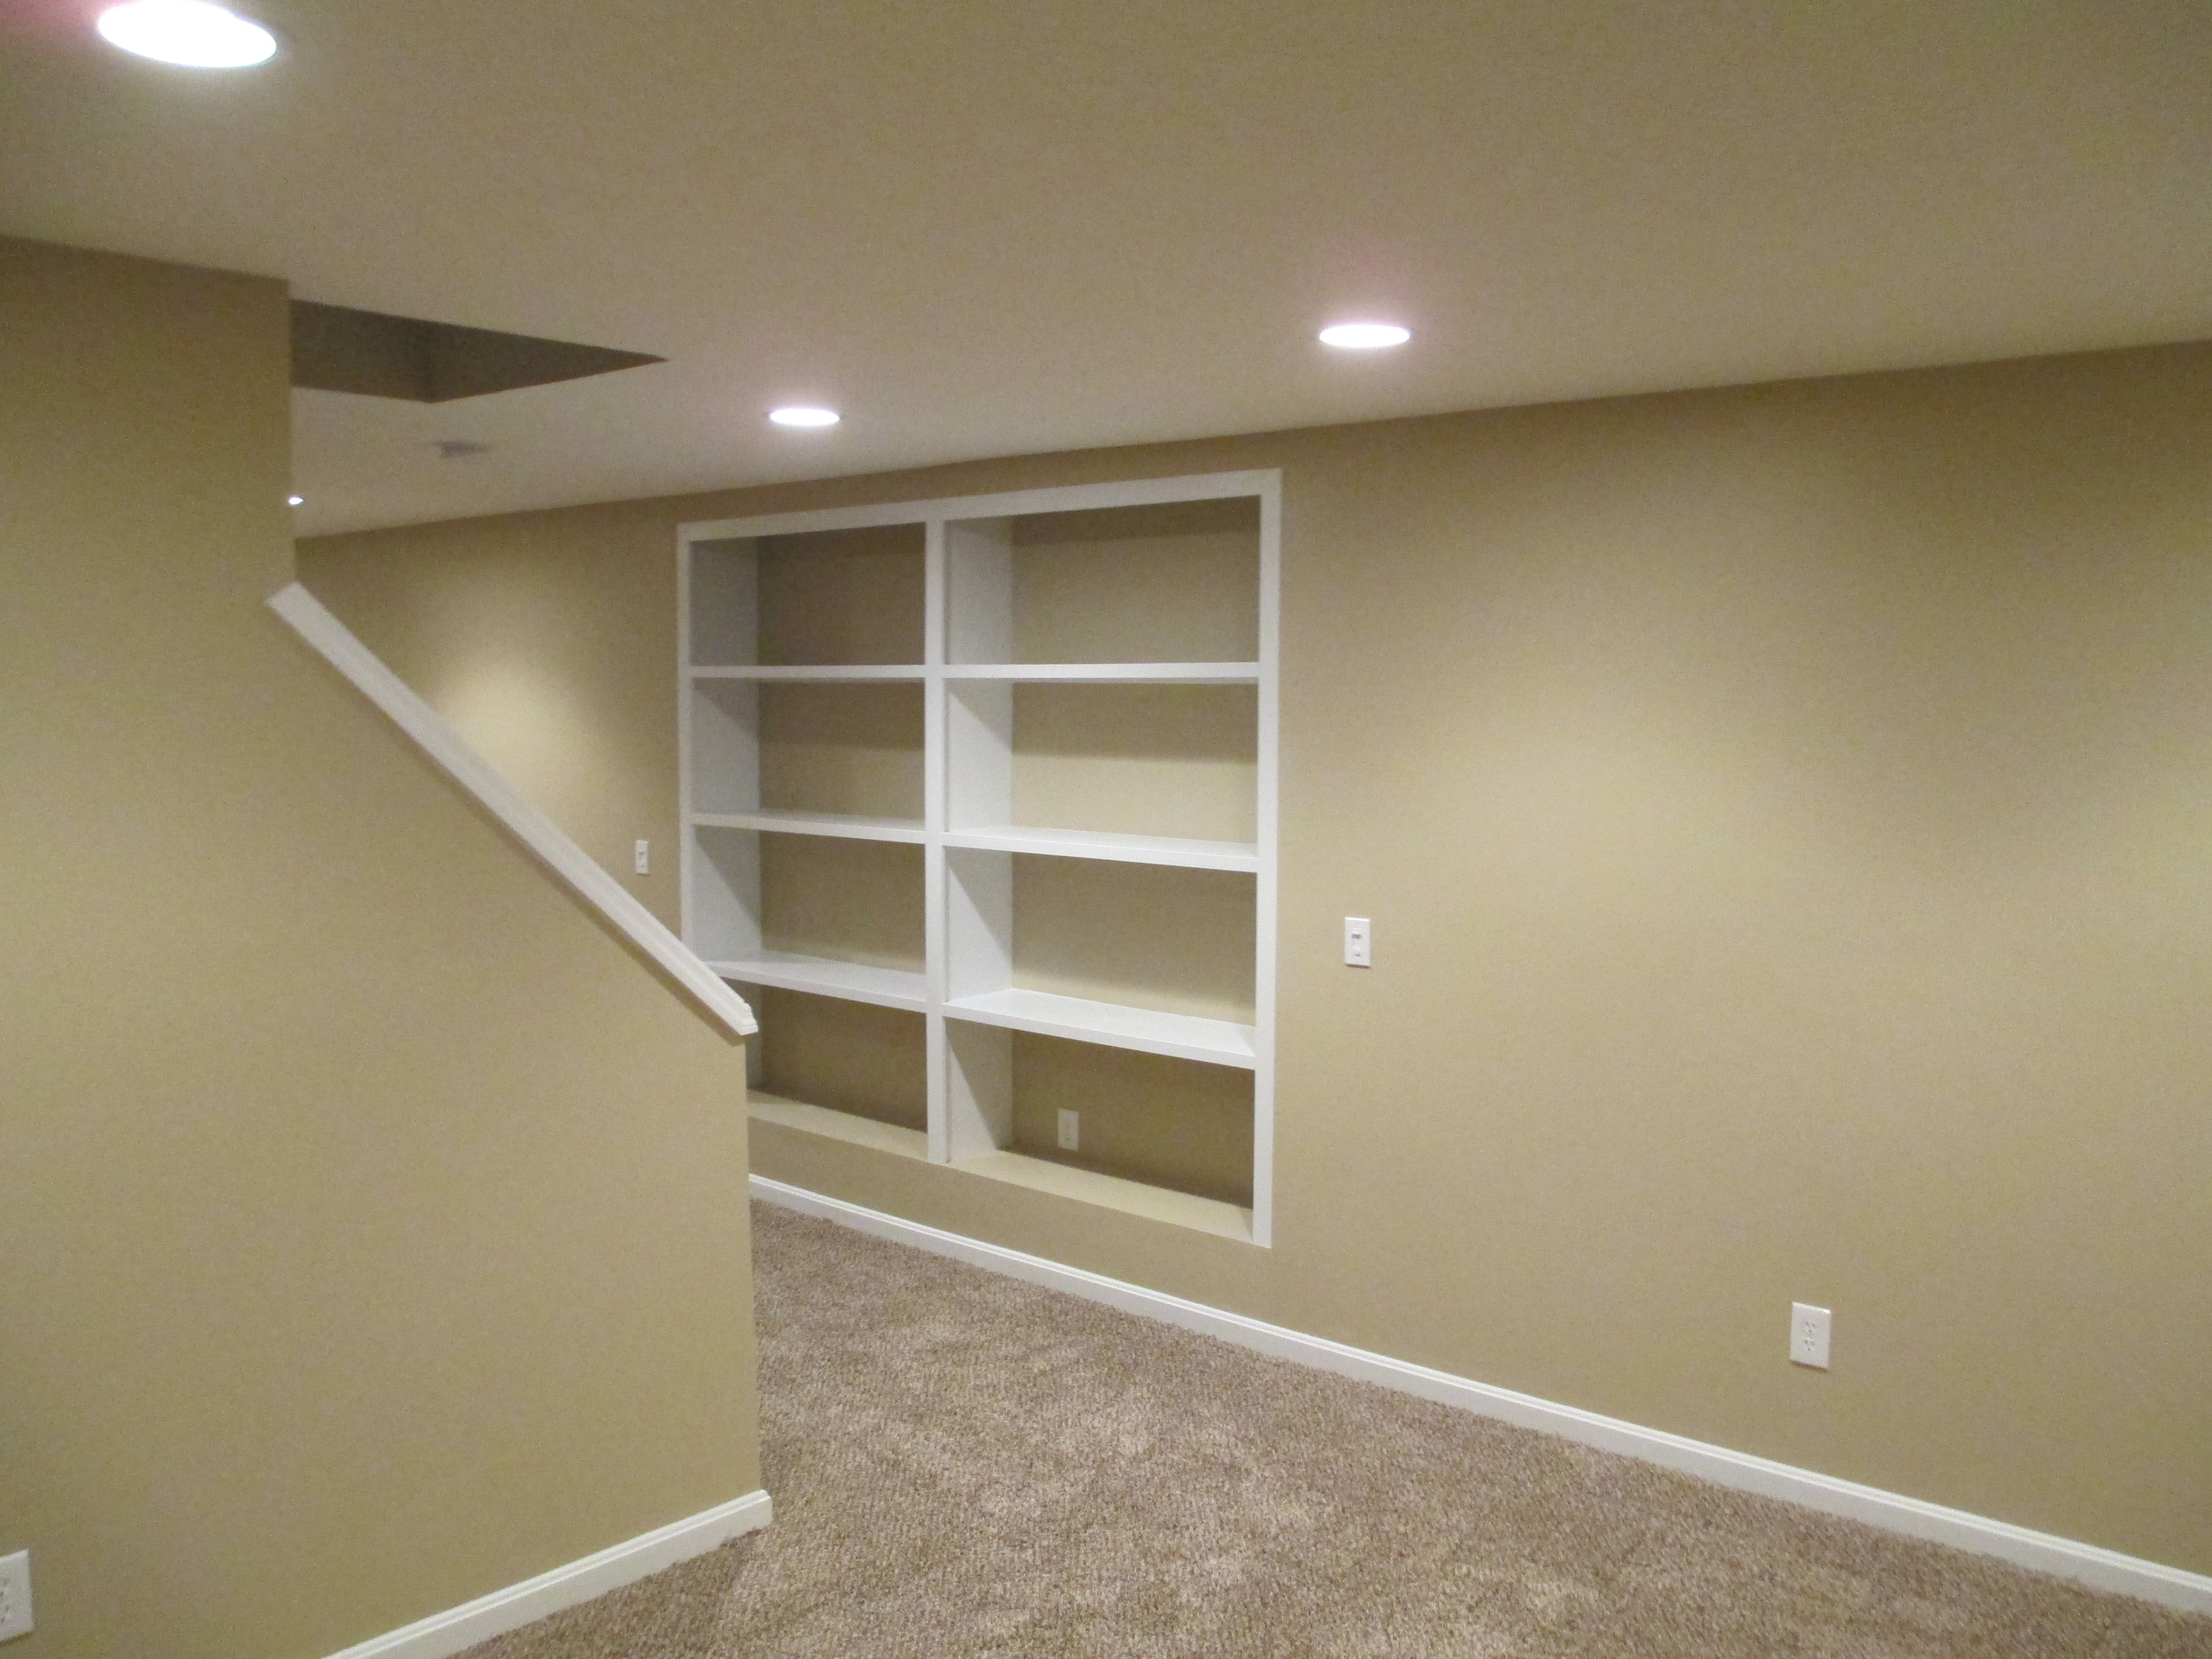 New Richmond Interior Paint